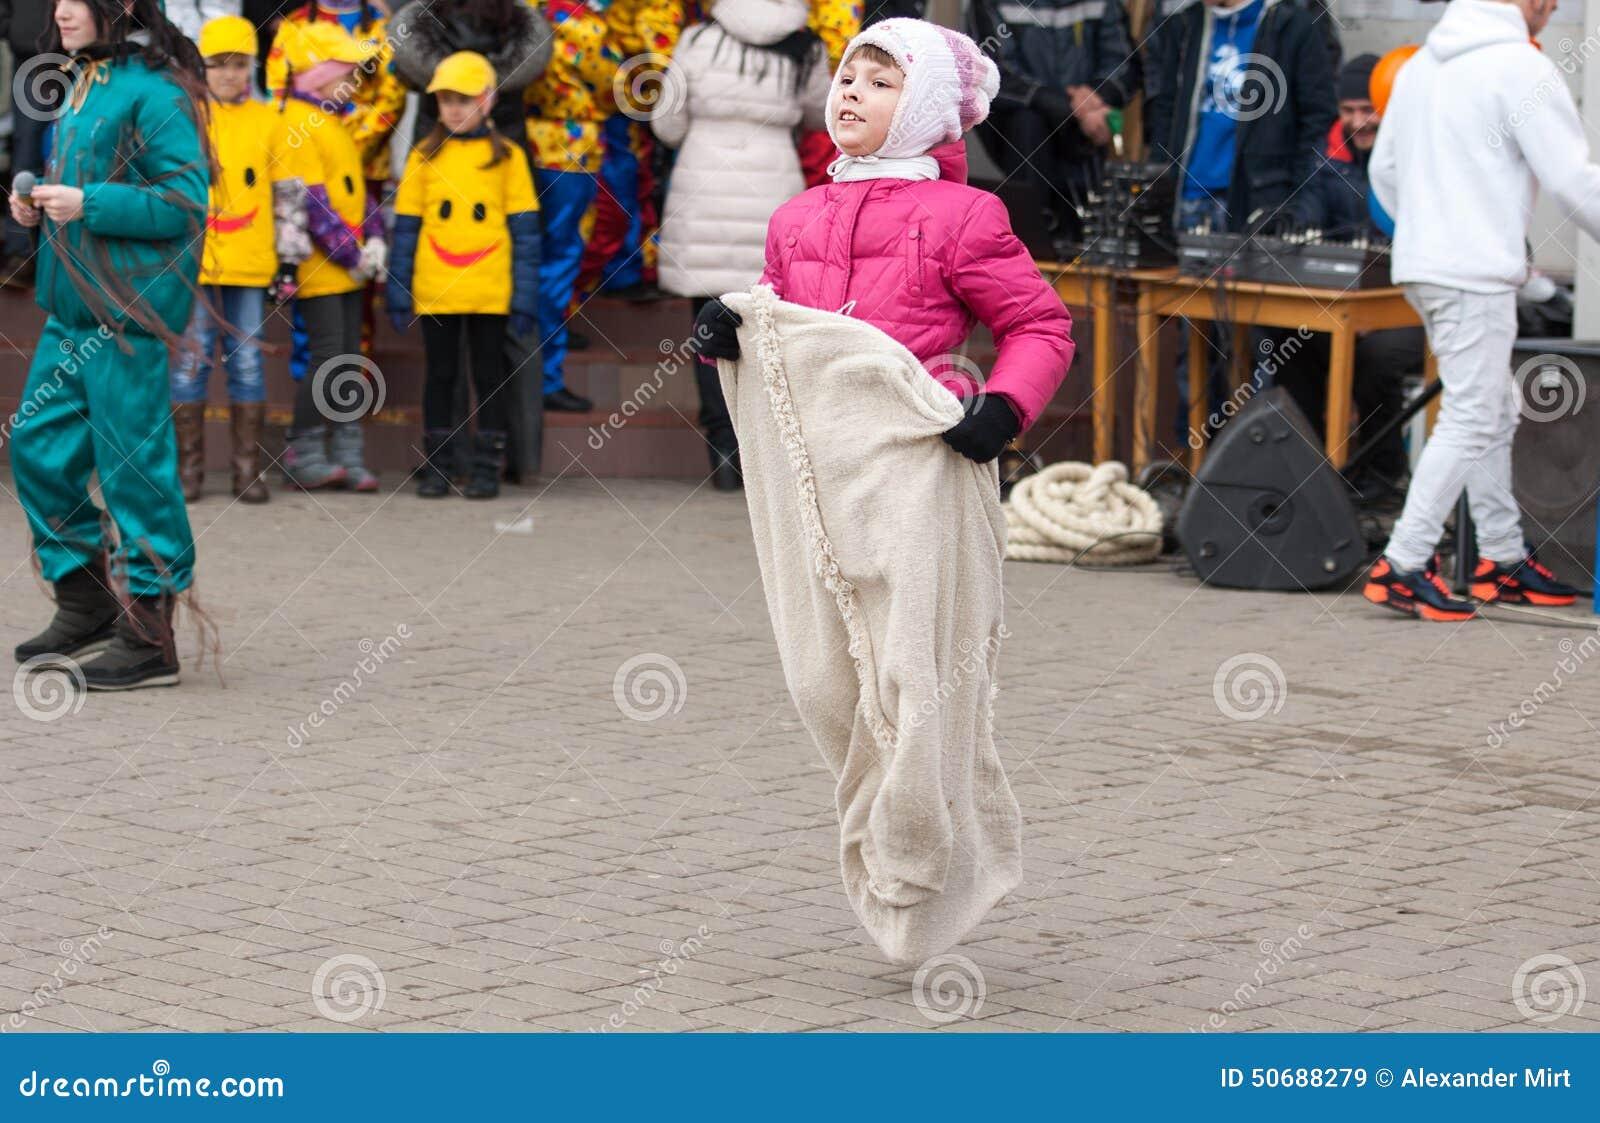 Download 大袋奔跑 编辑类库存图片. 图片 包括有 食物, 文化, 舞蹈, 伙计, 男朋友, 种族, 孩子, 乐趣 - 50688279